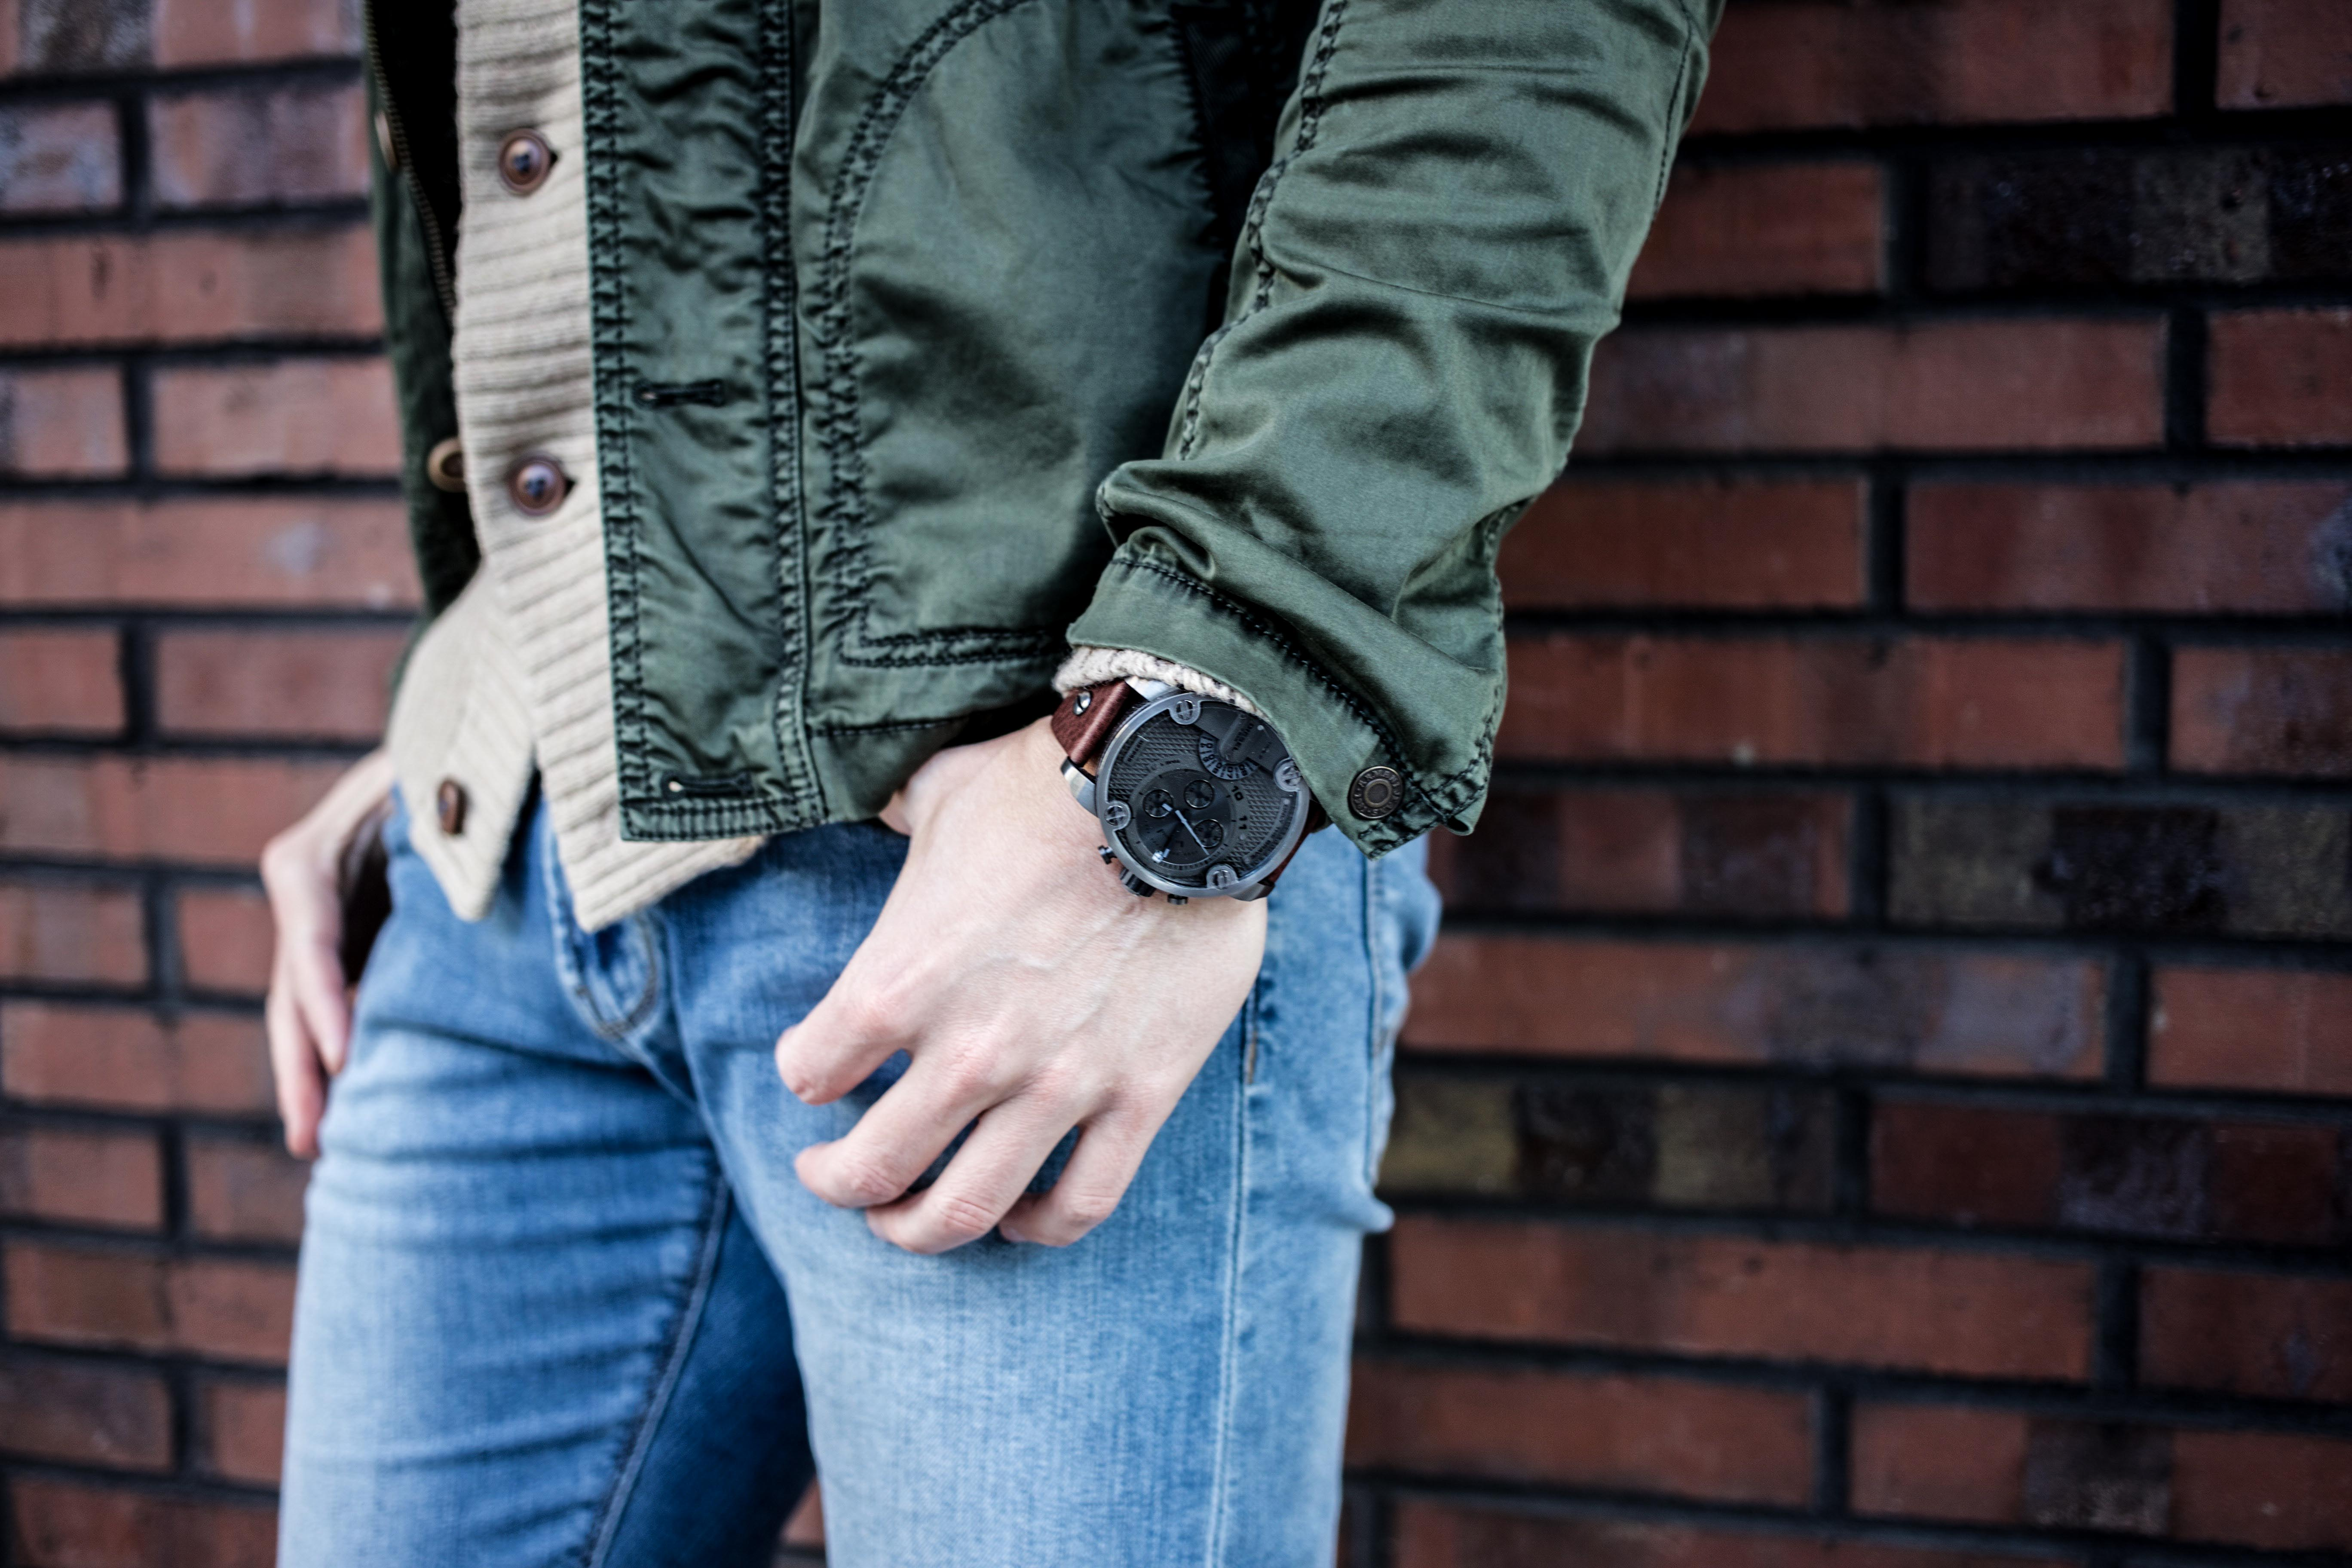 strickjacke-kombinieren-männer-beige-cardigan-blue-jeans-fashionblog-berlin-modeblog_9012